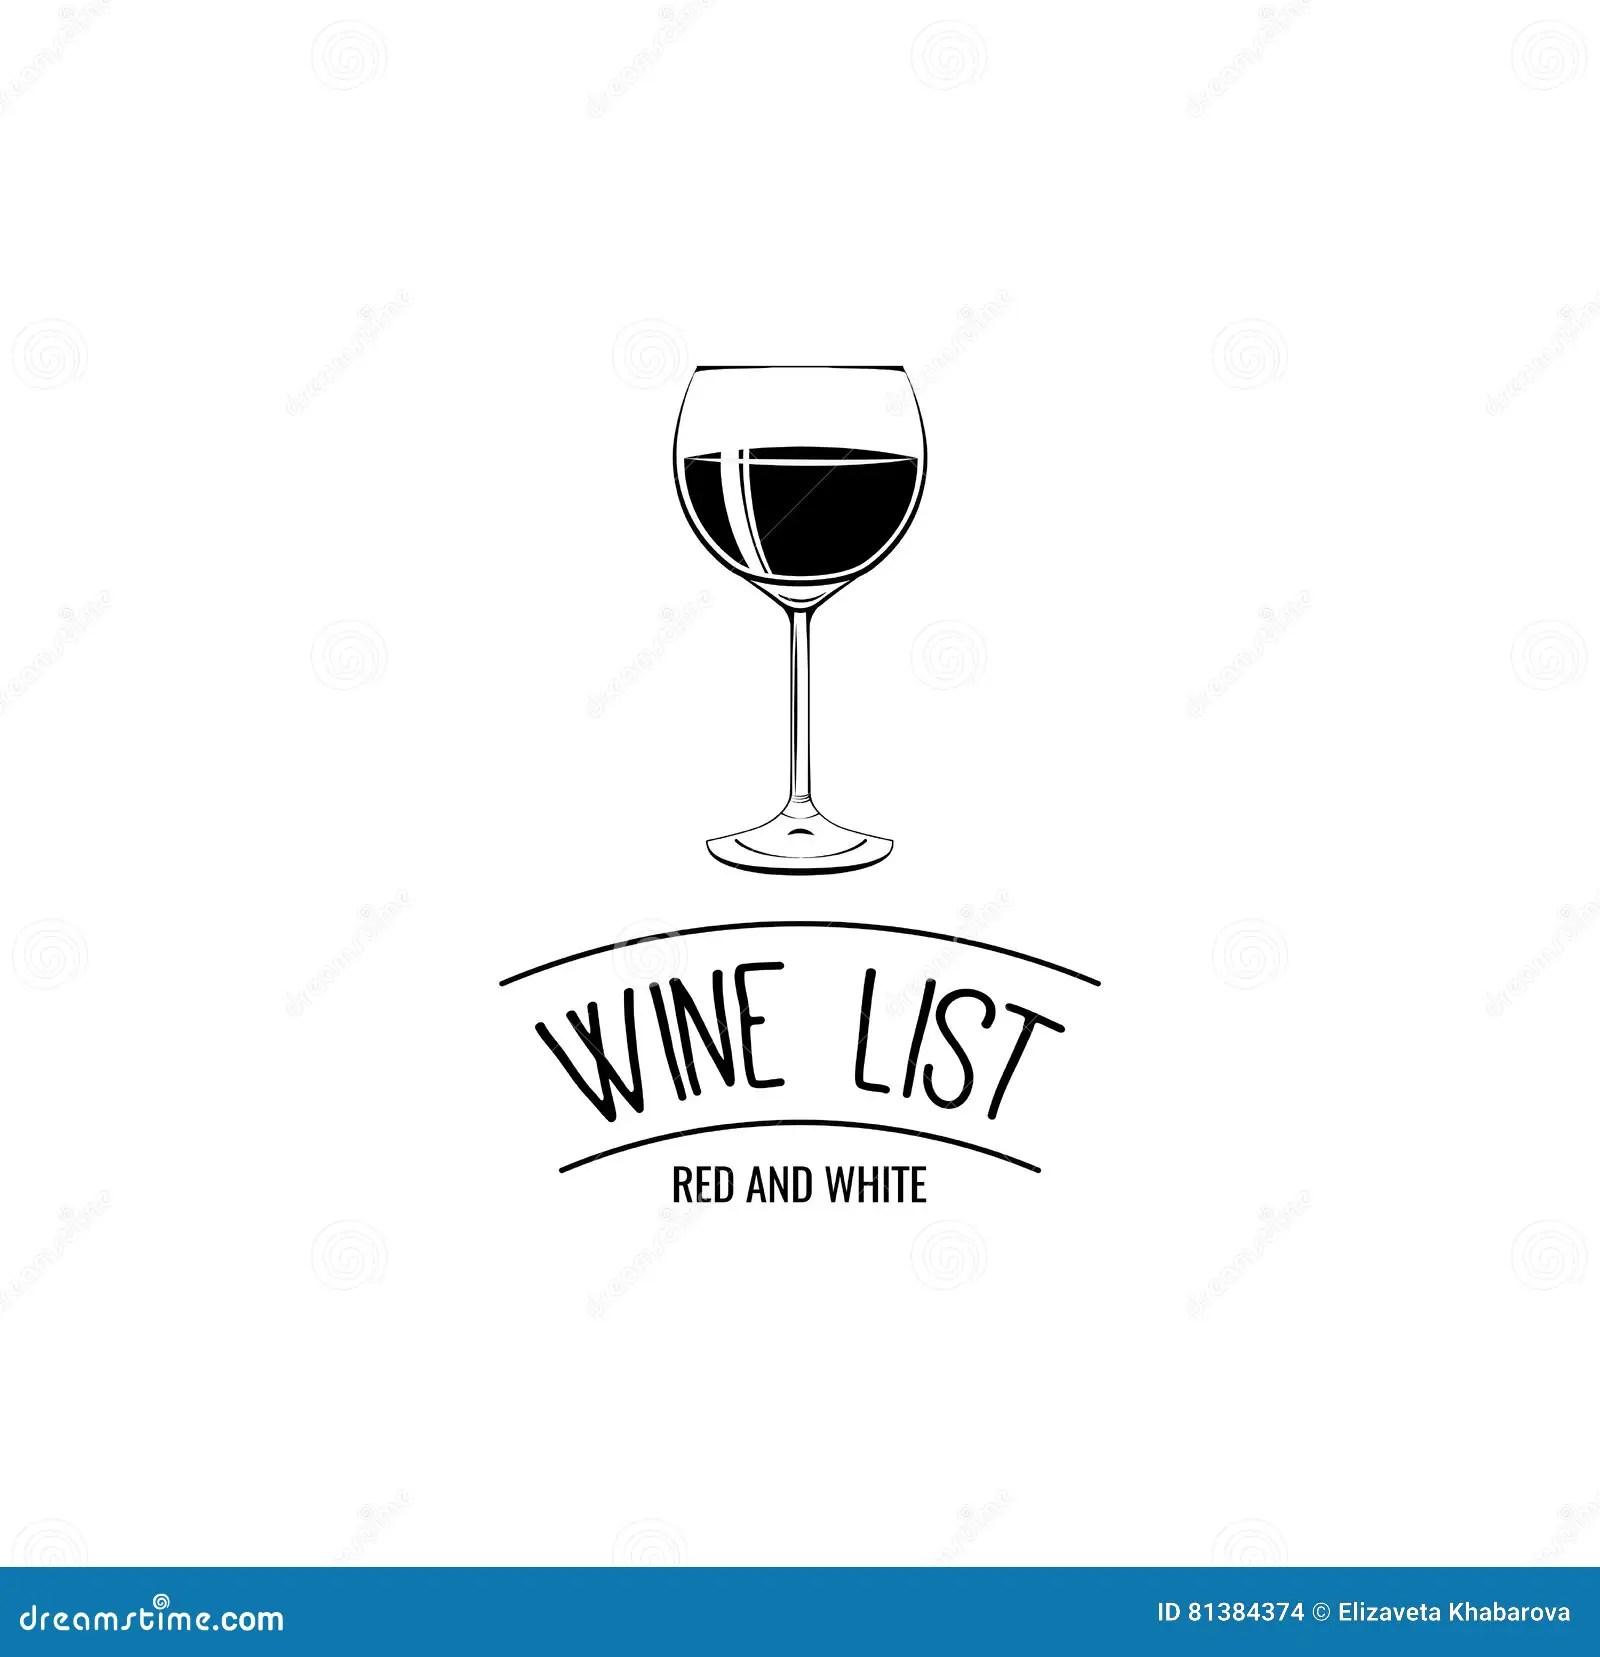 Wine List Glass Menu Card Design Template. Stock Vector